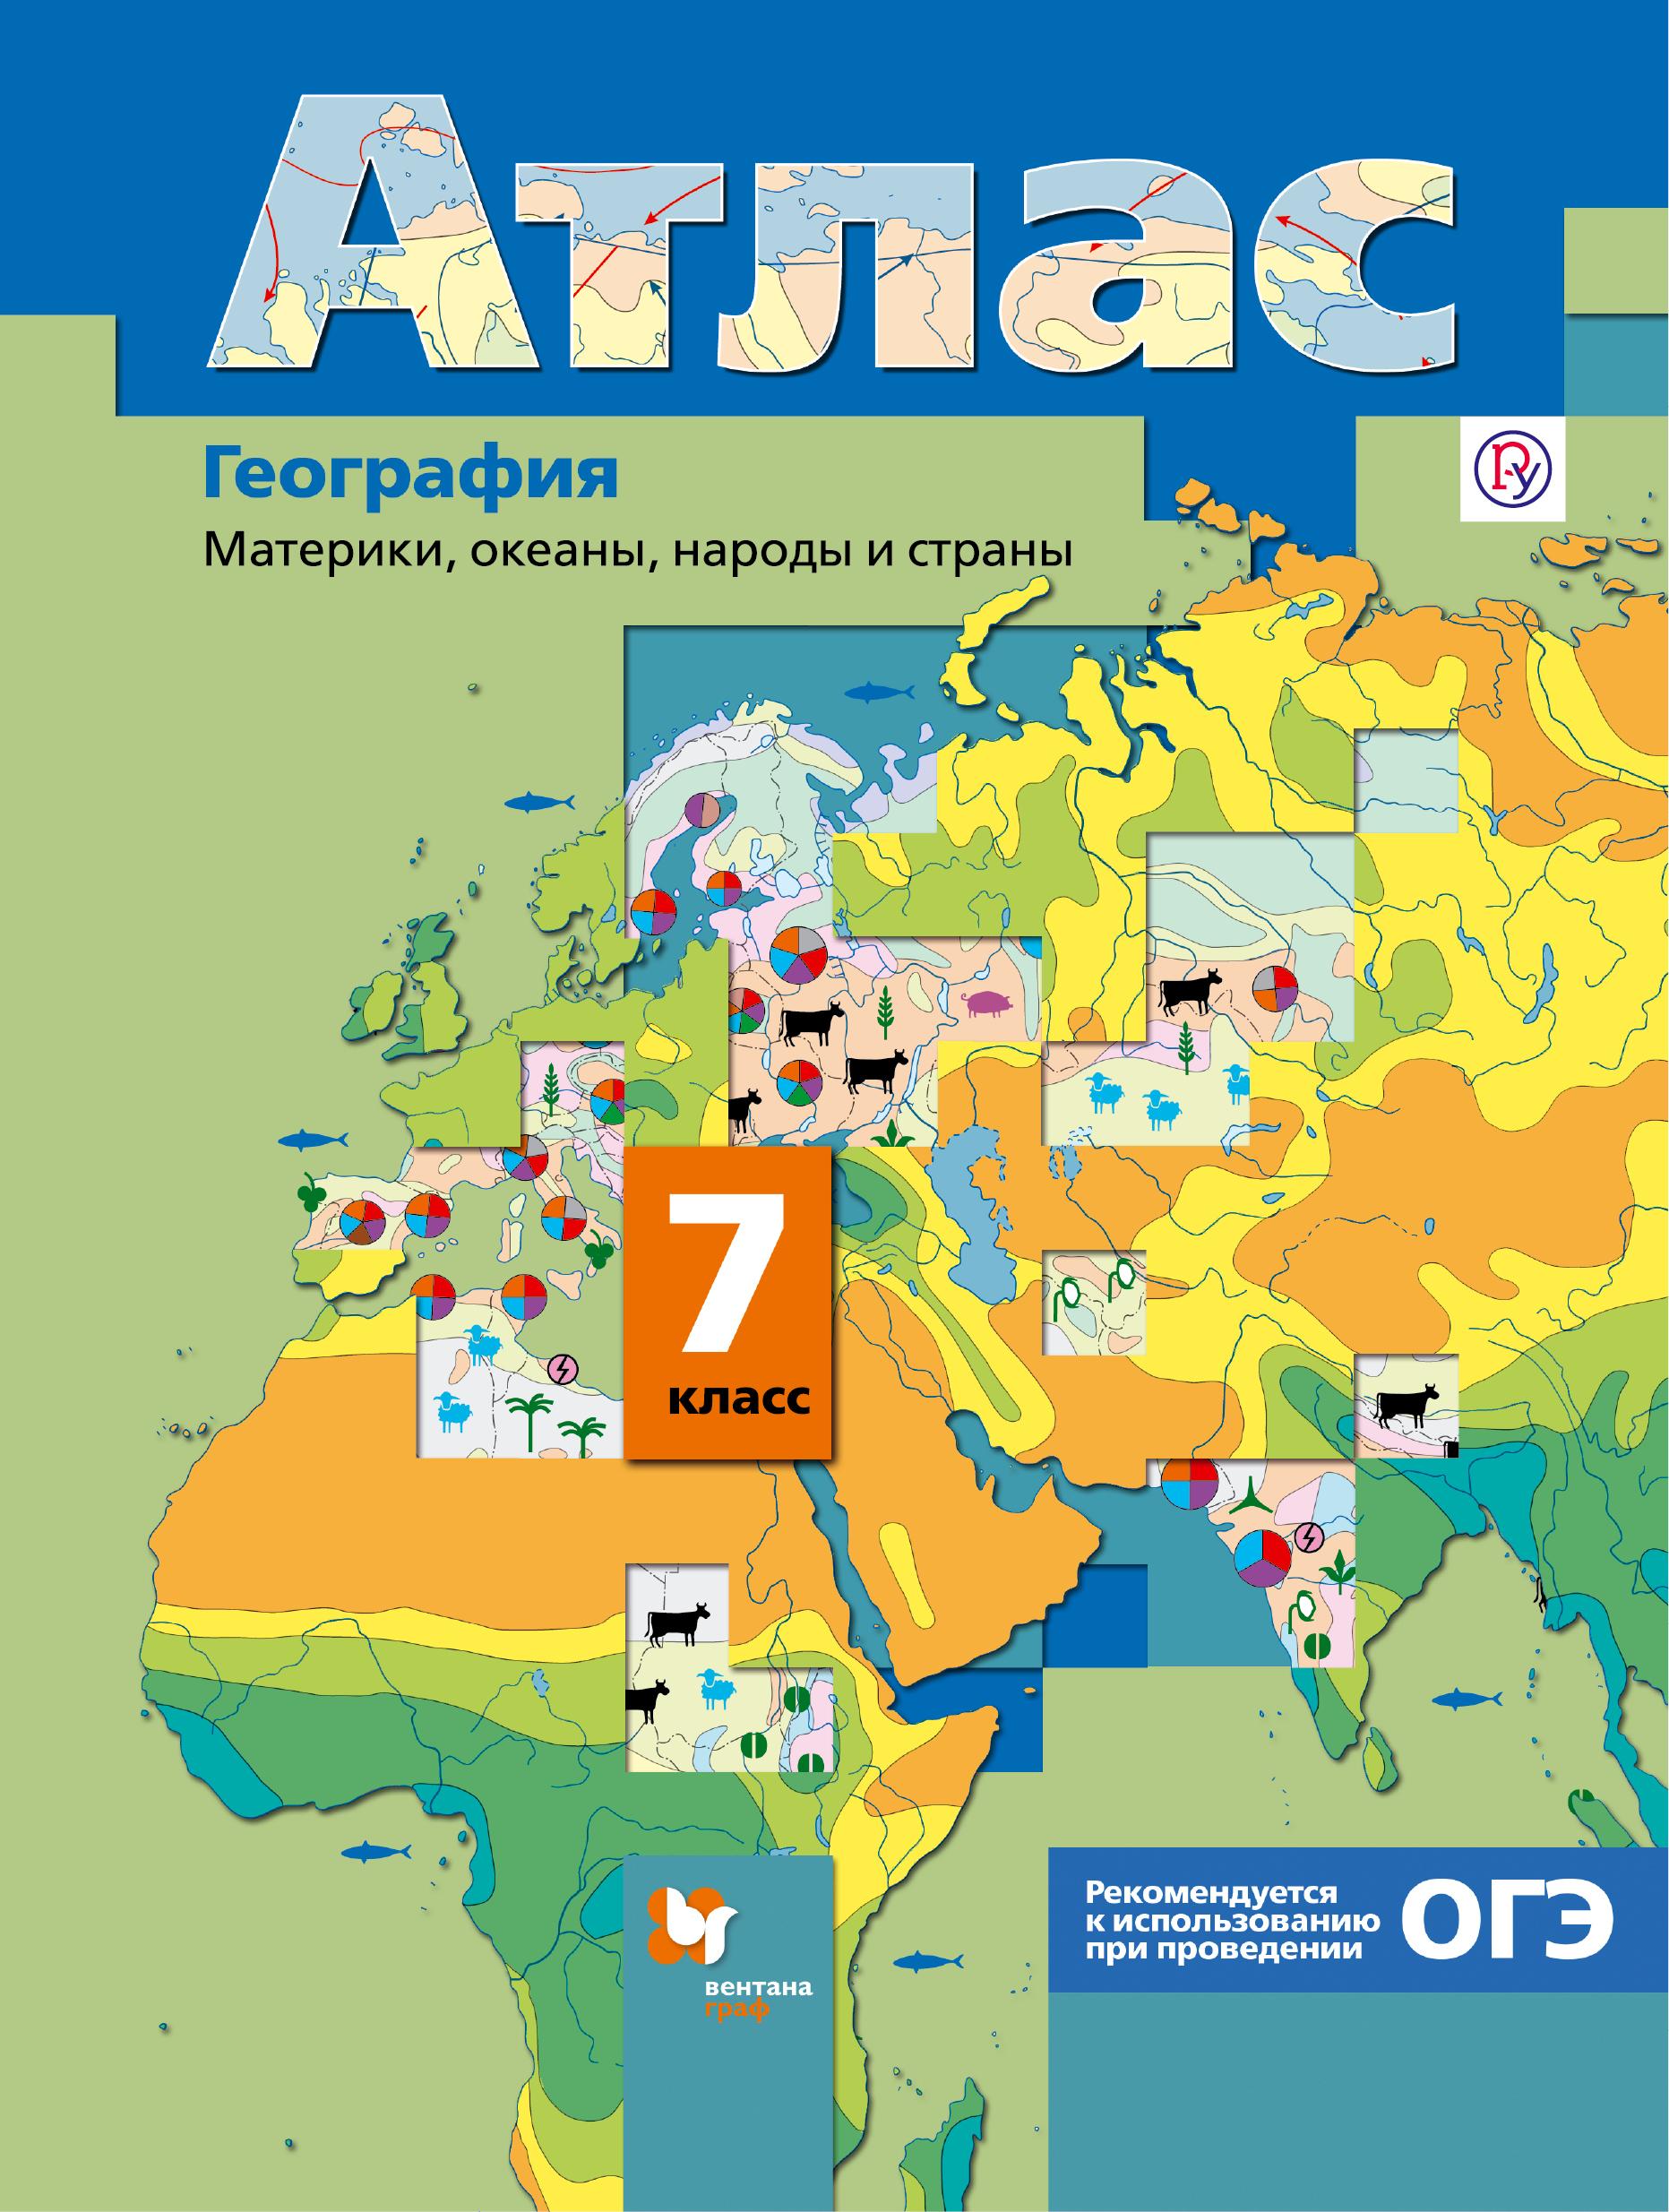 География. Материки, океаны, народы и страны. 7класс. Атлас от book24.ru